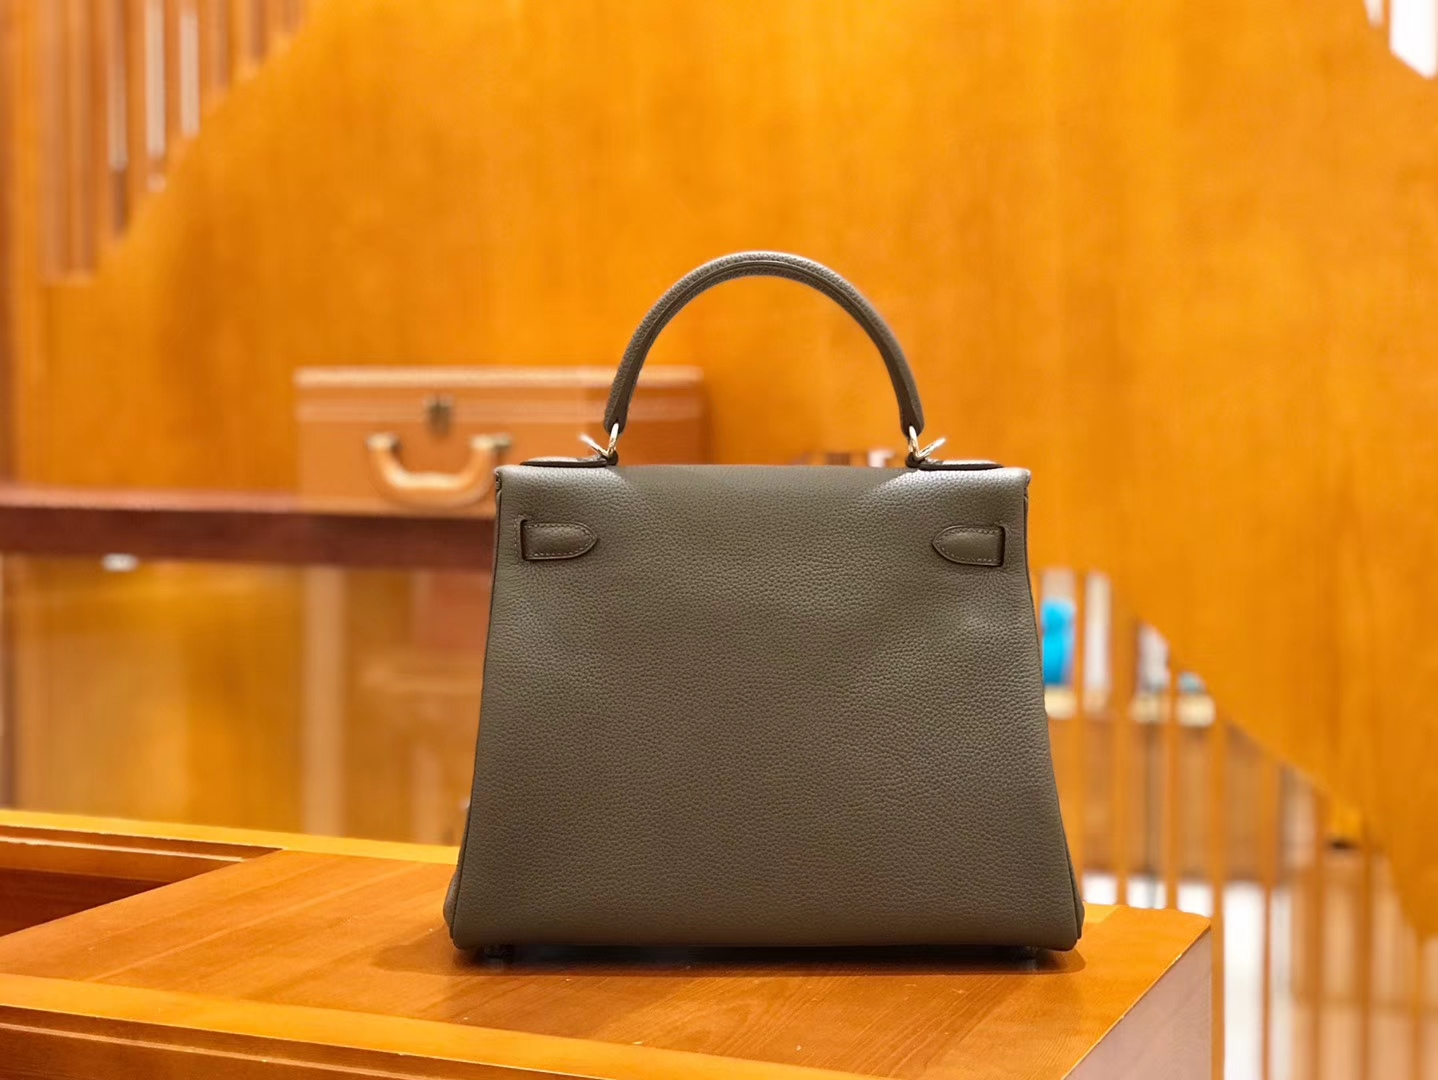 Hermès(爱马仕)Kelly 28cm togo 牛皮 锡器灰 银扣 全手工缝制 现货